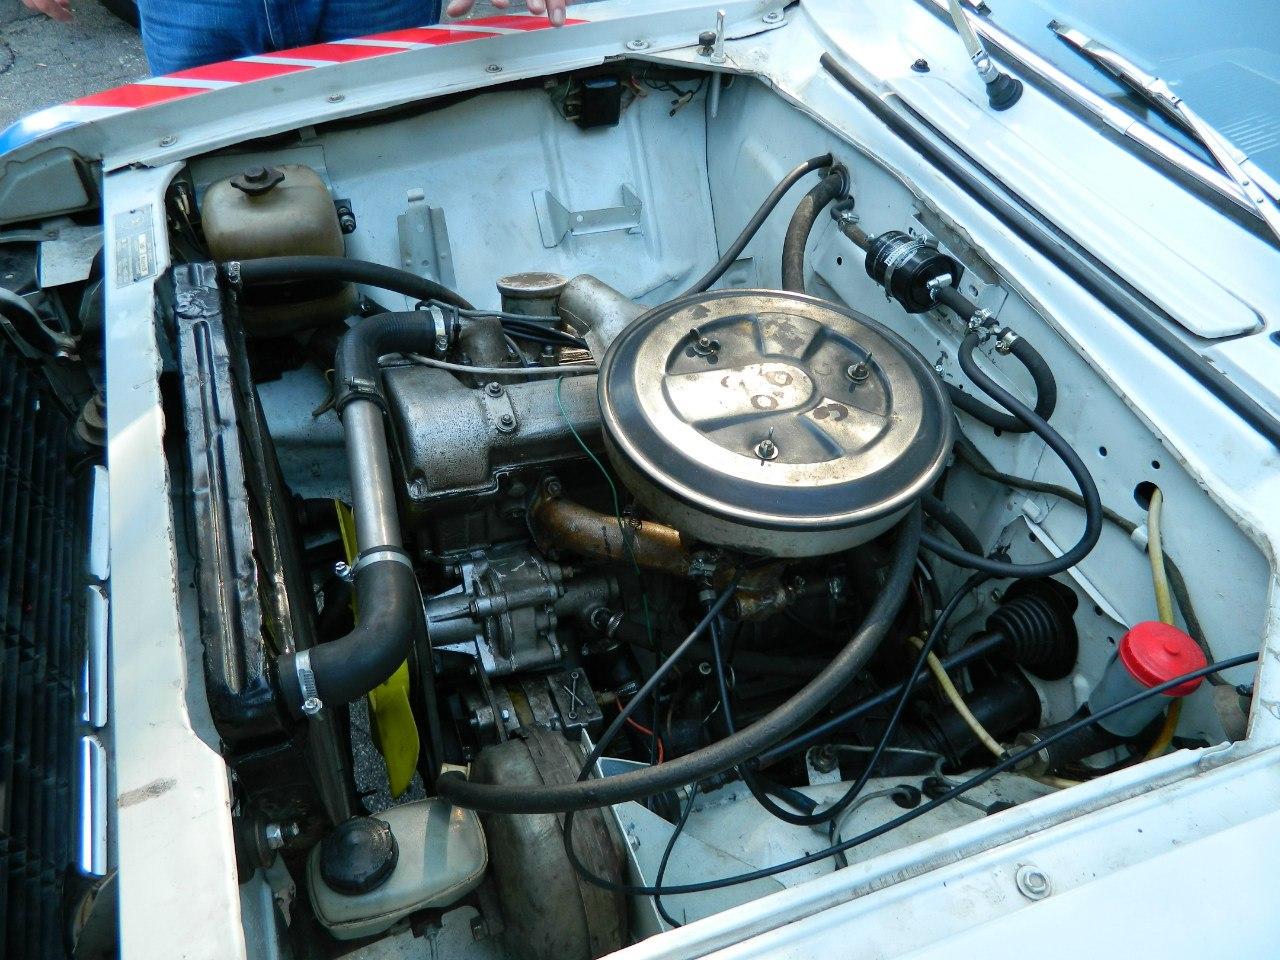 Ремонт двигателя москвича 412 своими руками 826